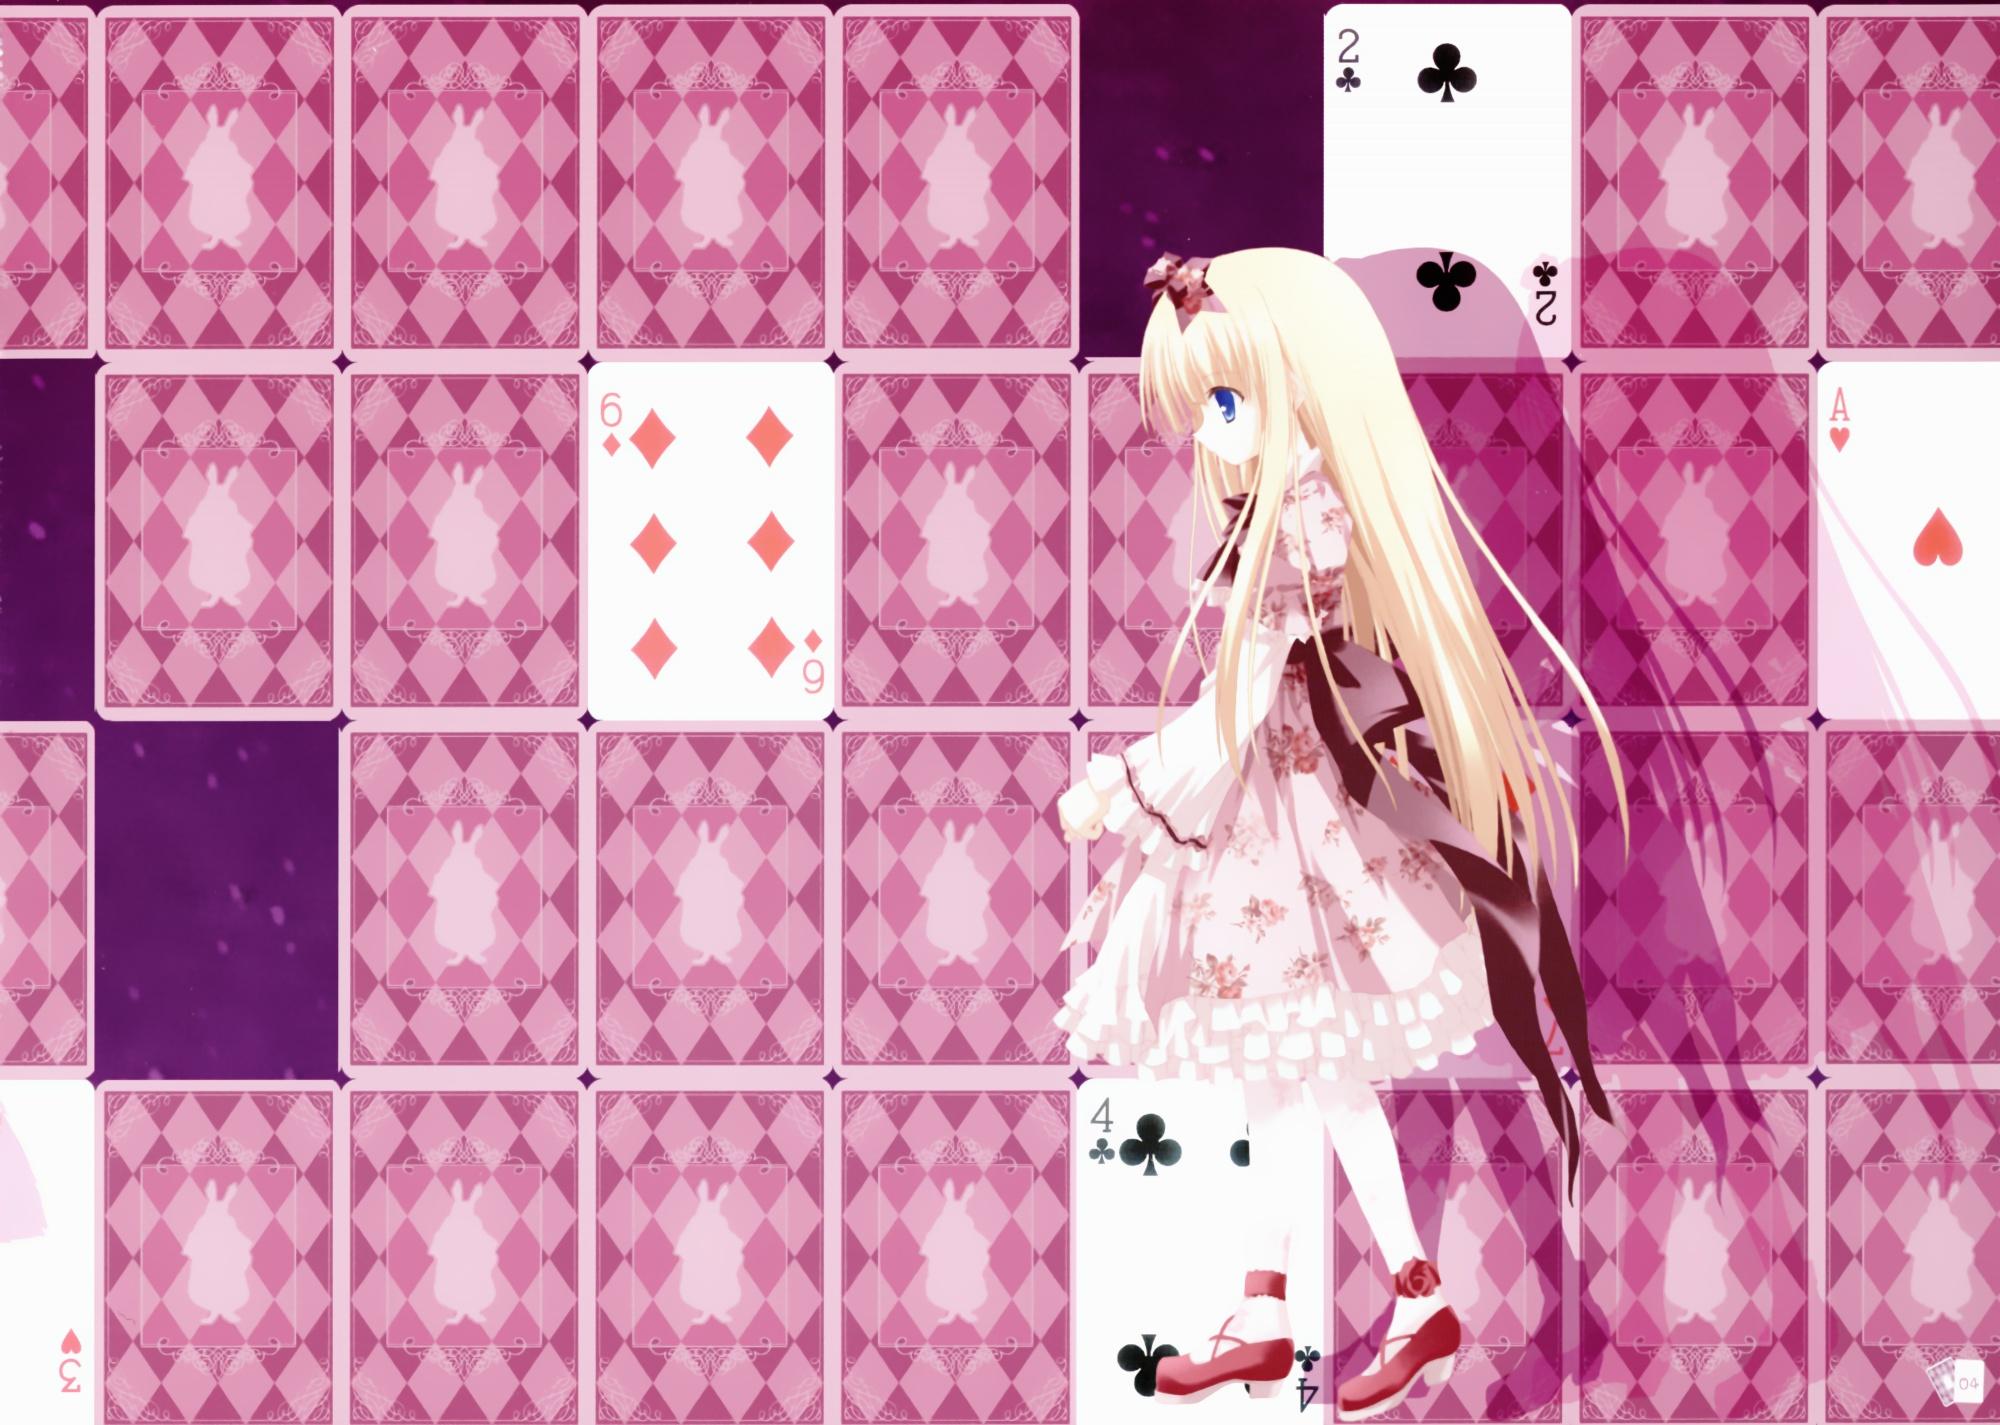 alice_(wonderland) alice_in_wonderland lolita_fashion tinkle